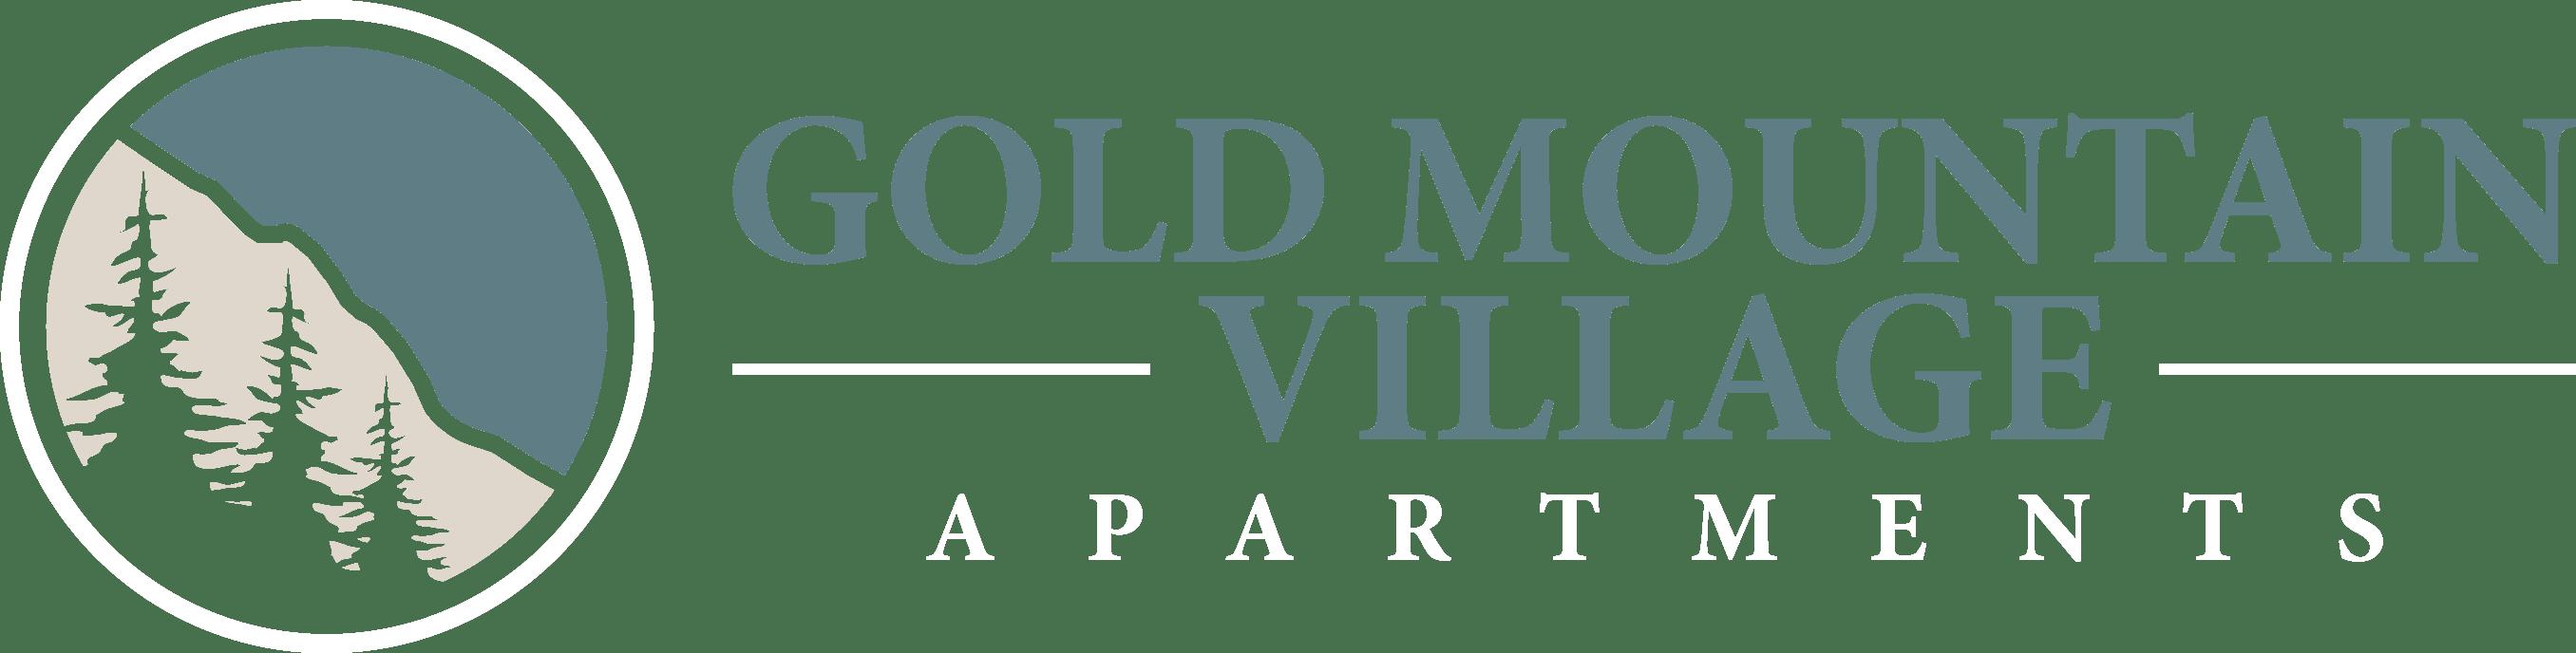 Gold Mountain Village Apartments